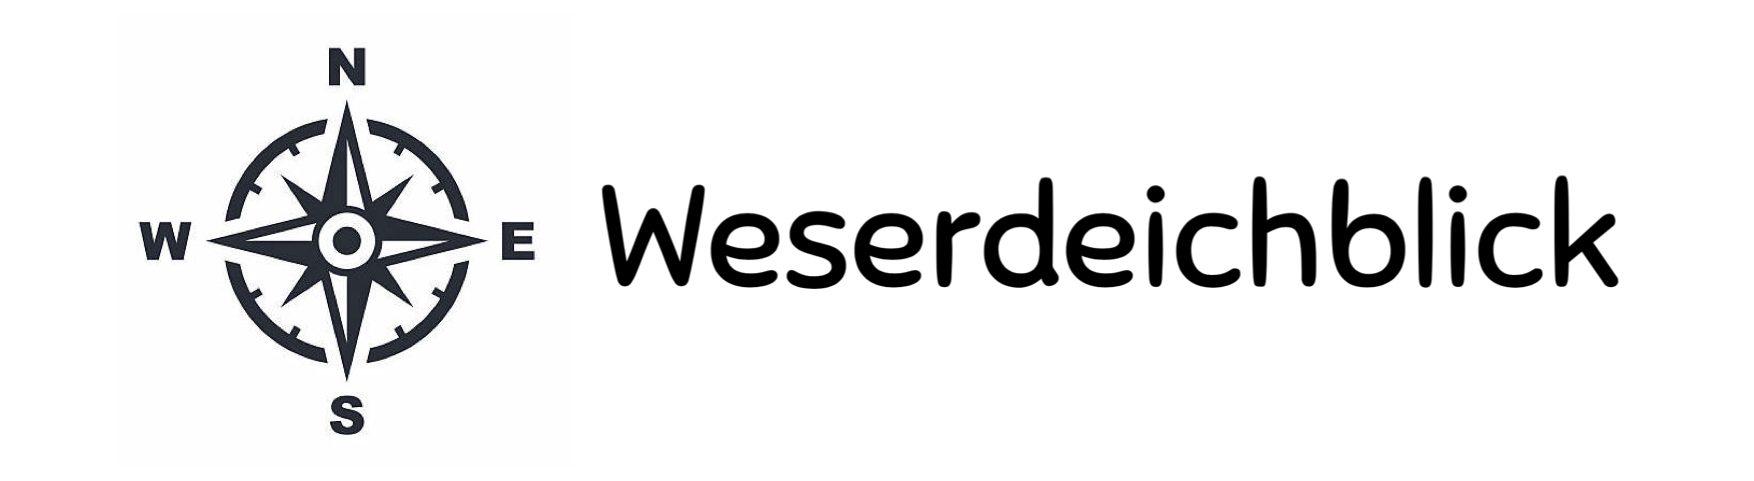 Weserdeichblick